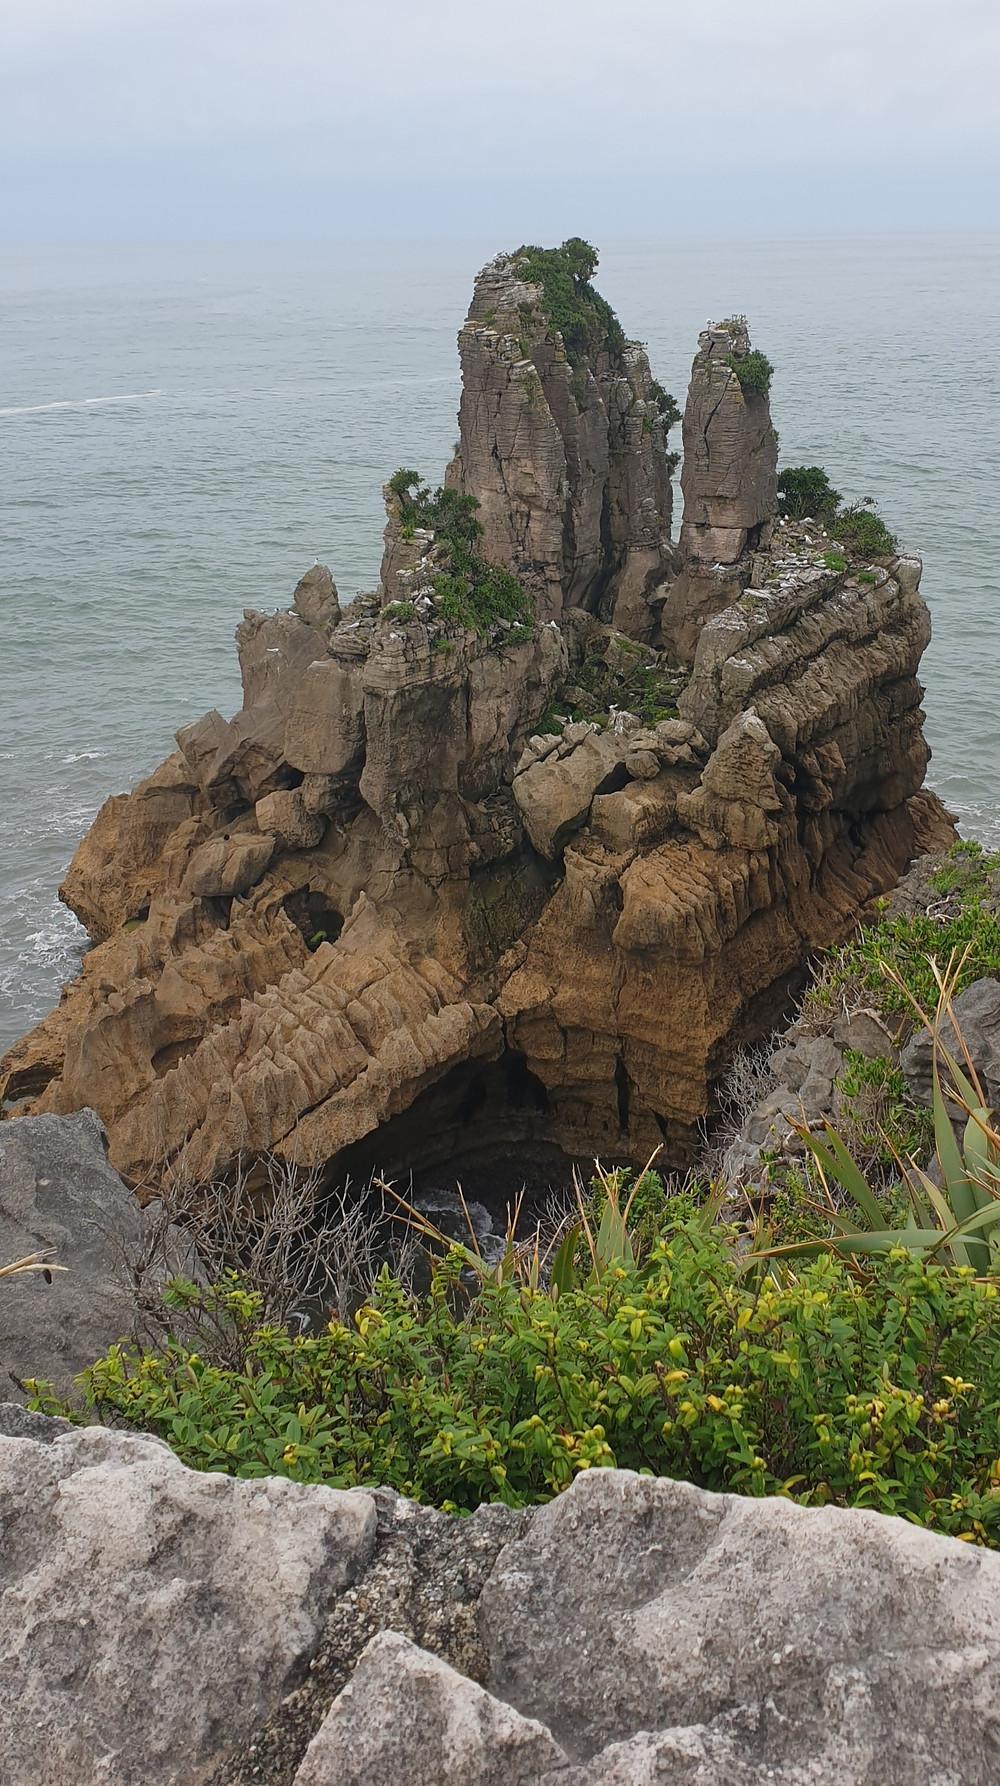 The remarkable Pancake Rocks